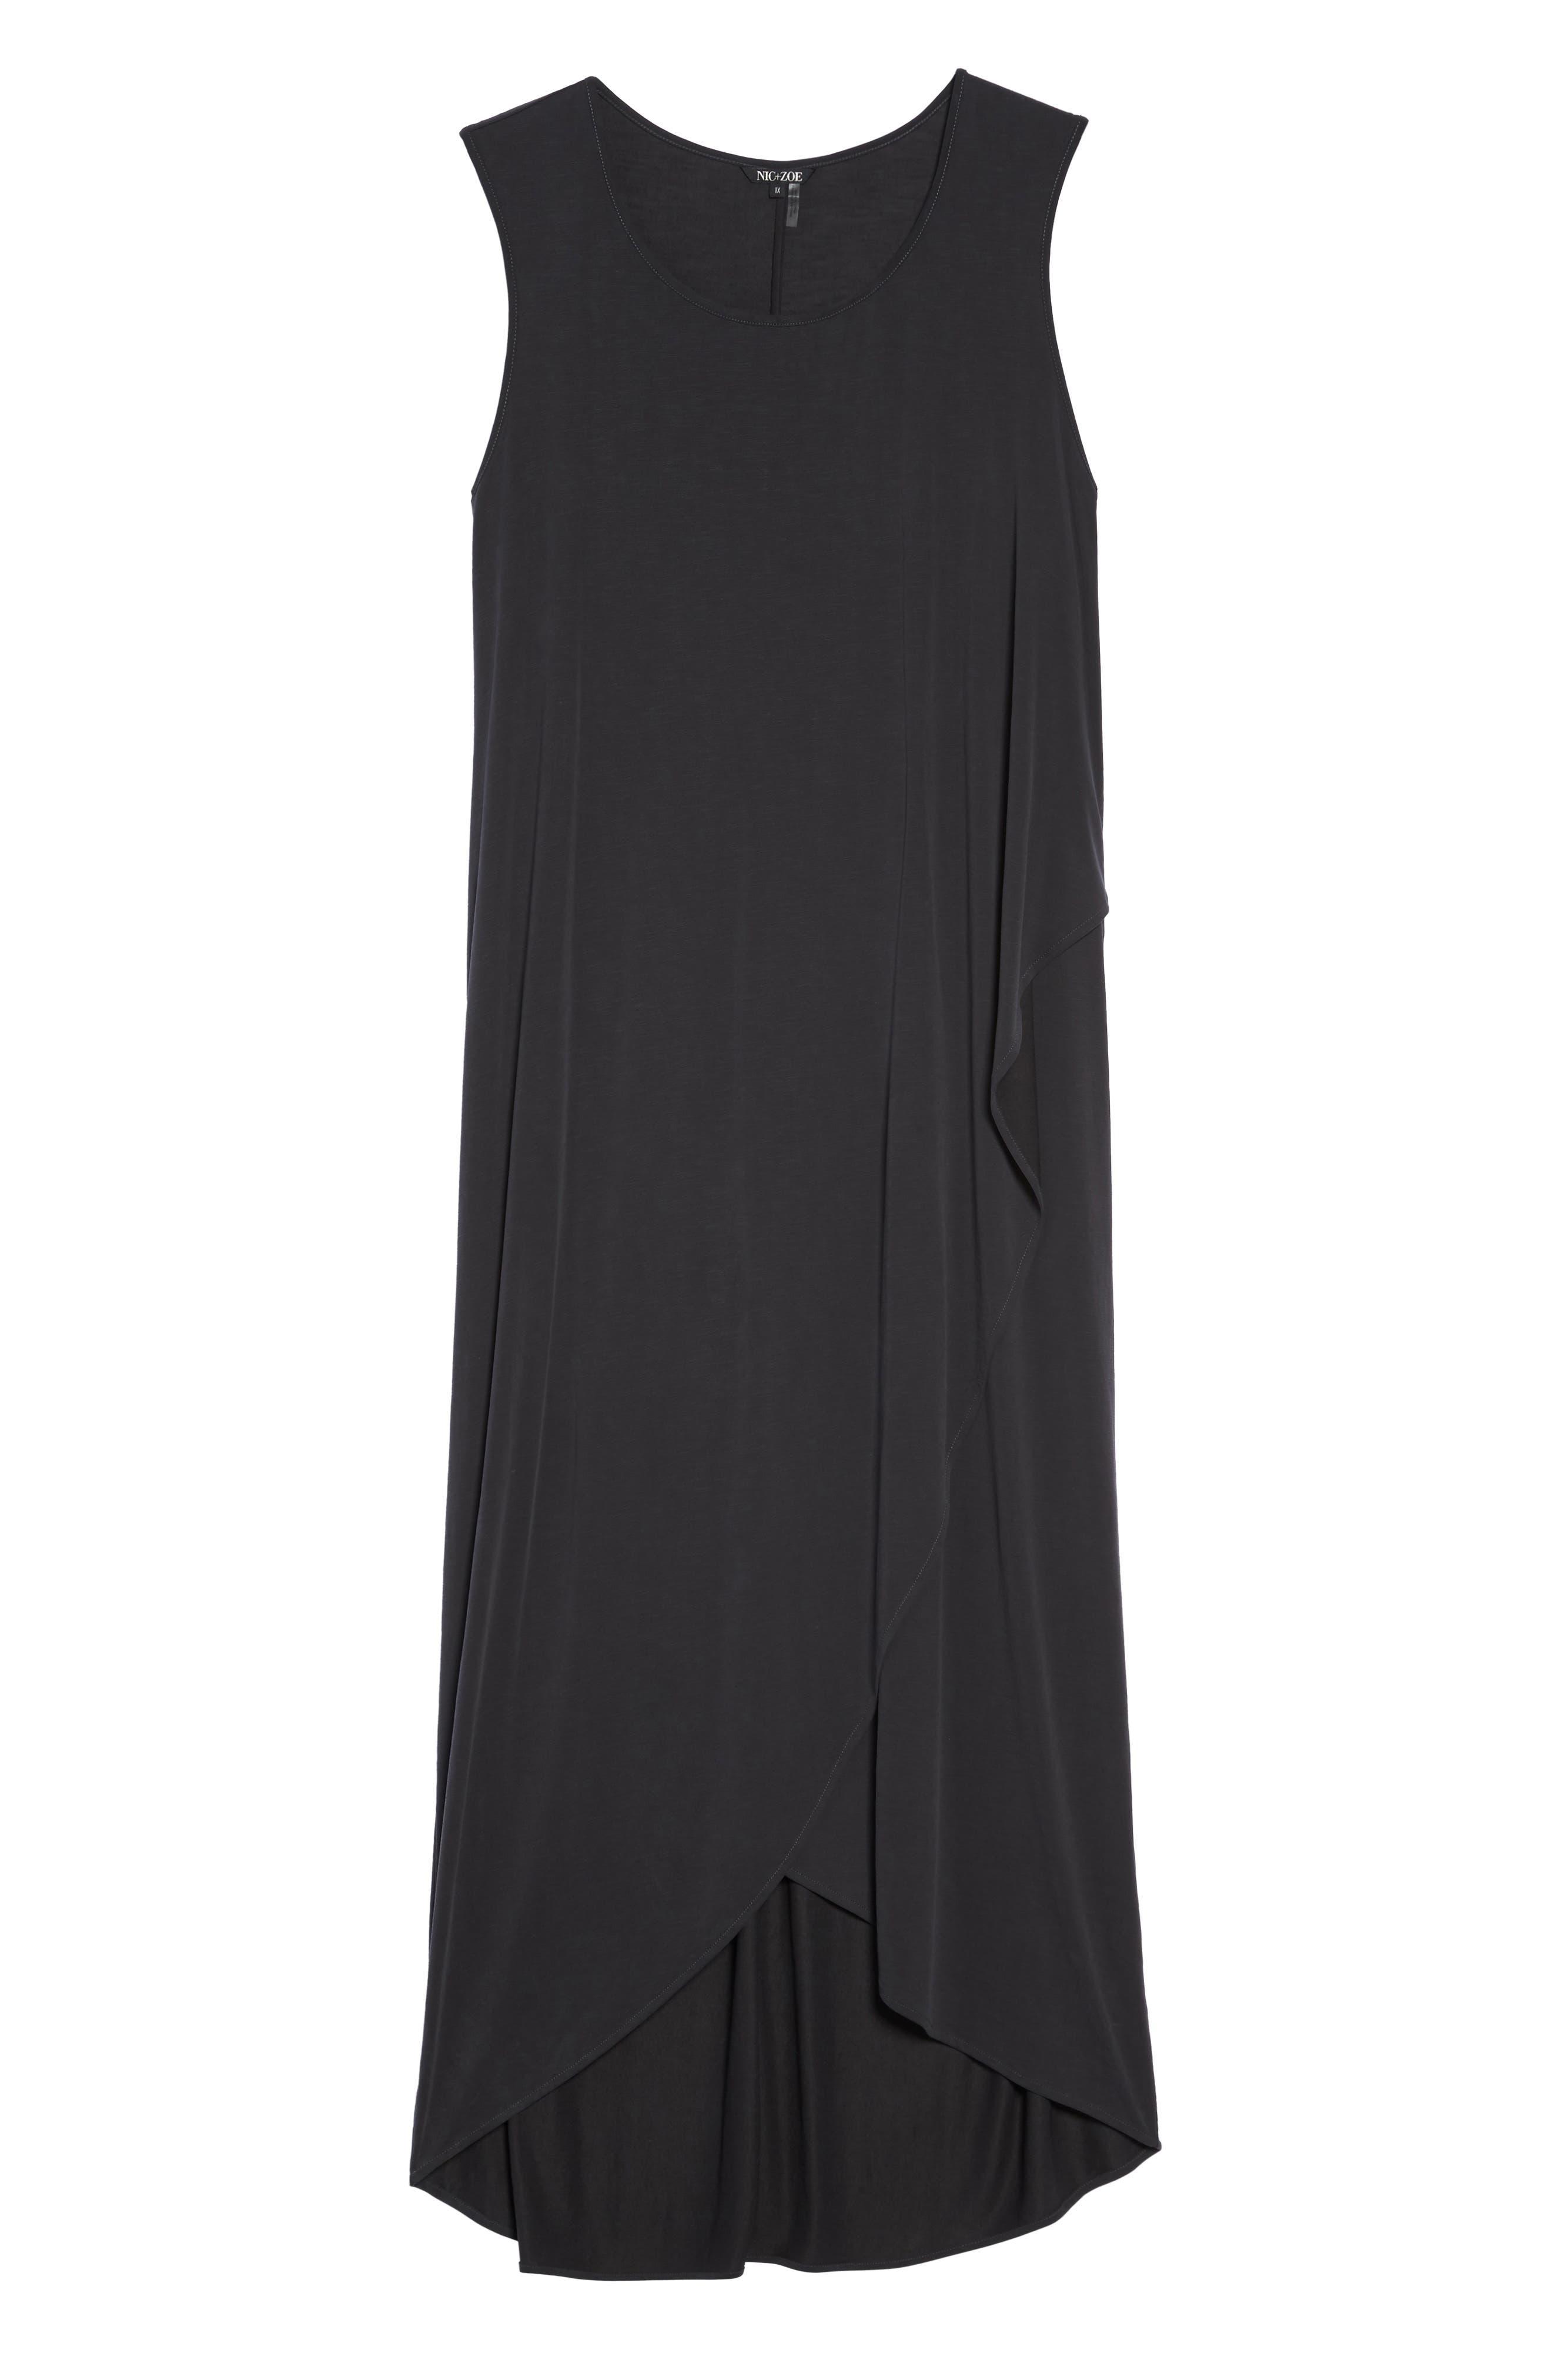 Boardwalk Jersey High/Low Dress,                             Alternate thumbnail 6, color,                             WASHED BLACK